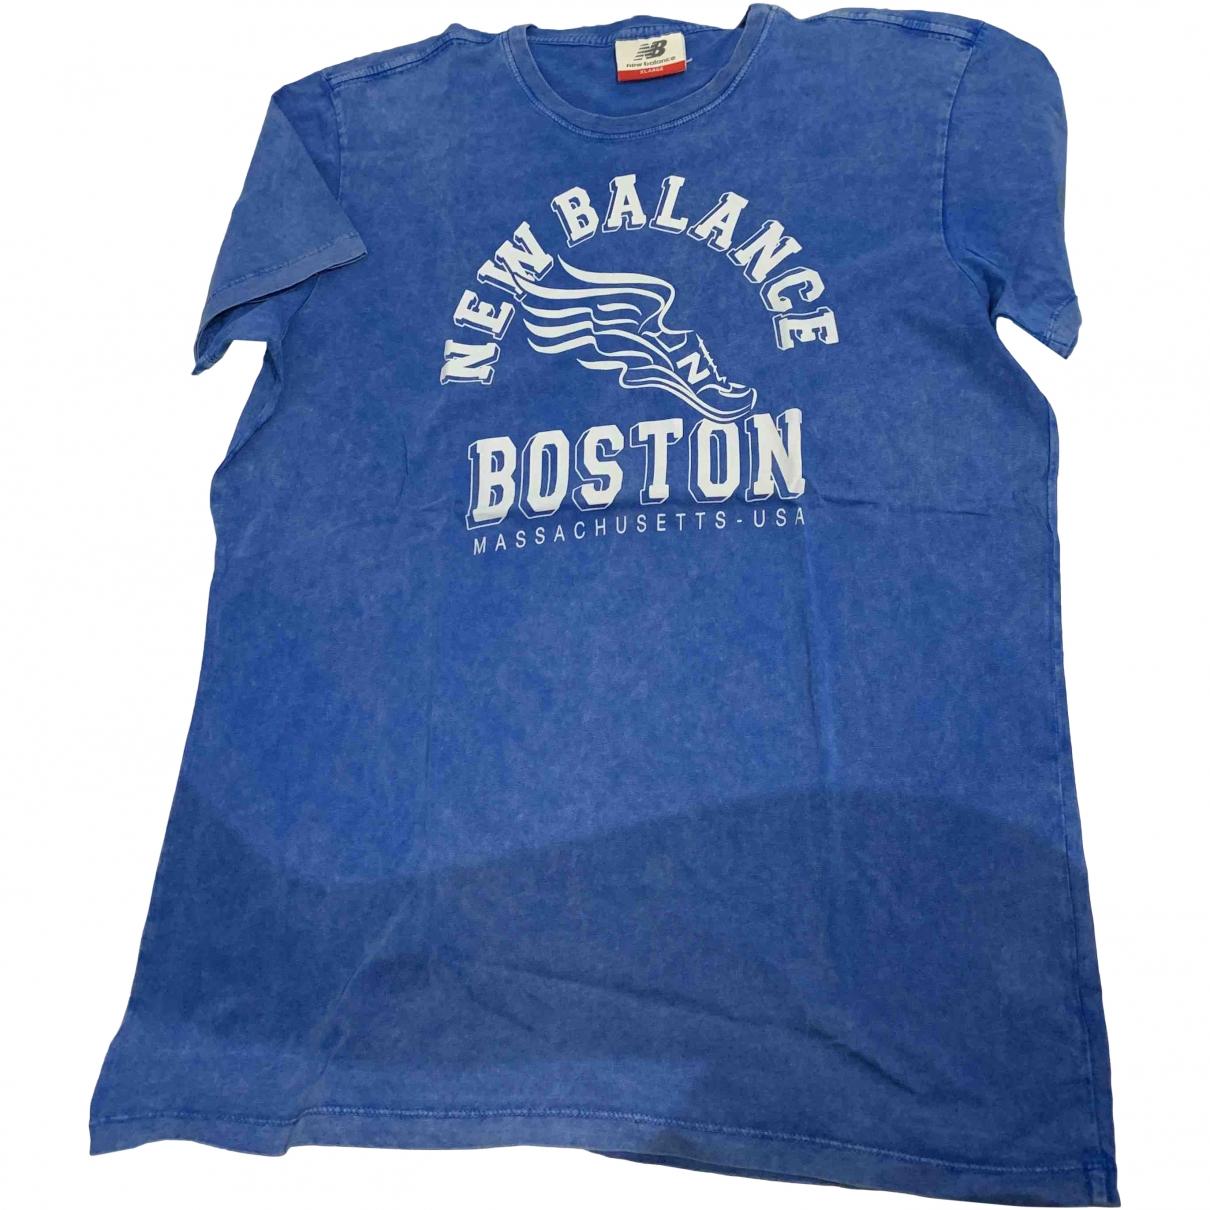 New Balance - Tee shirts   pour homme en coton - bleu